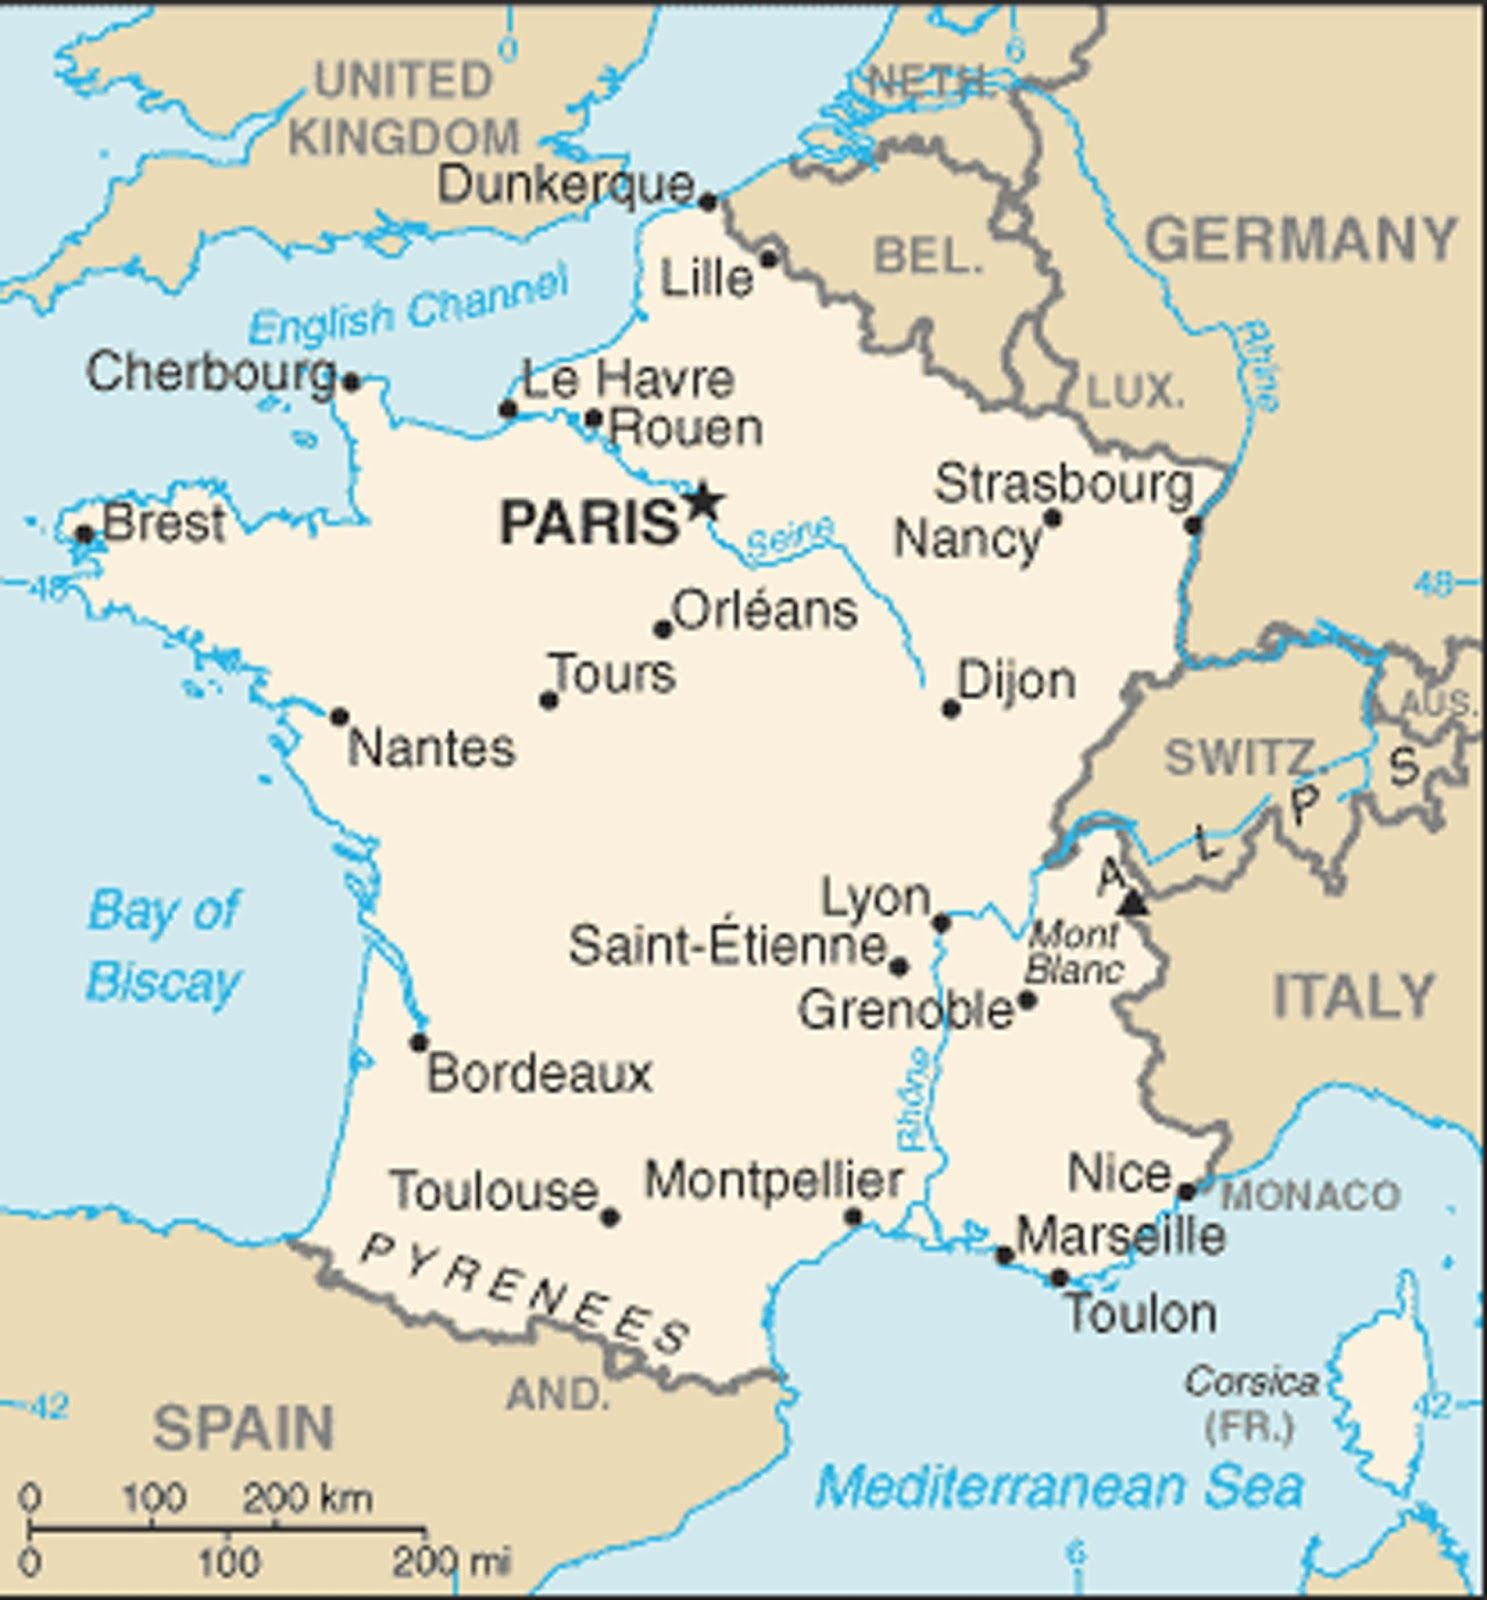 France Map Jpg 1487 1600 France Map France Travel France Country